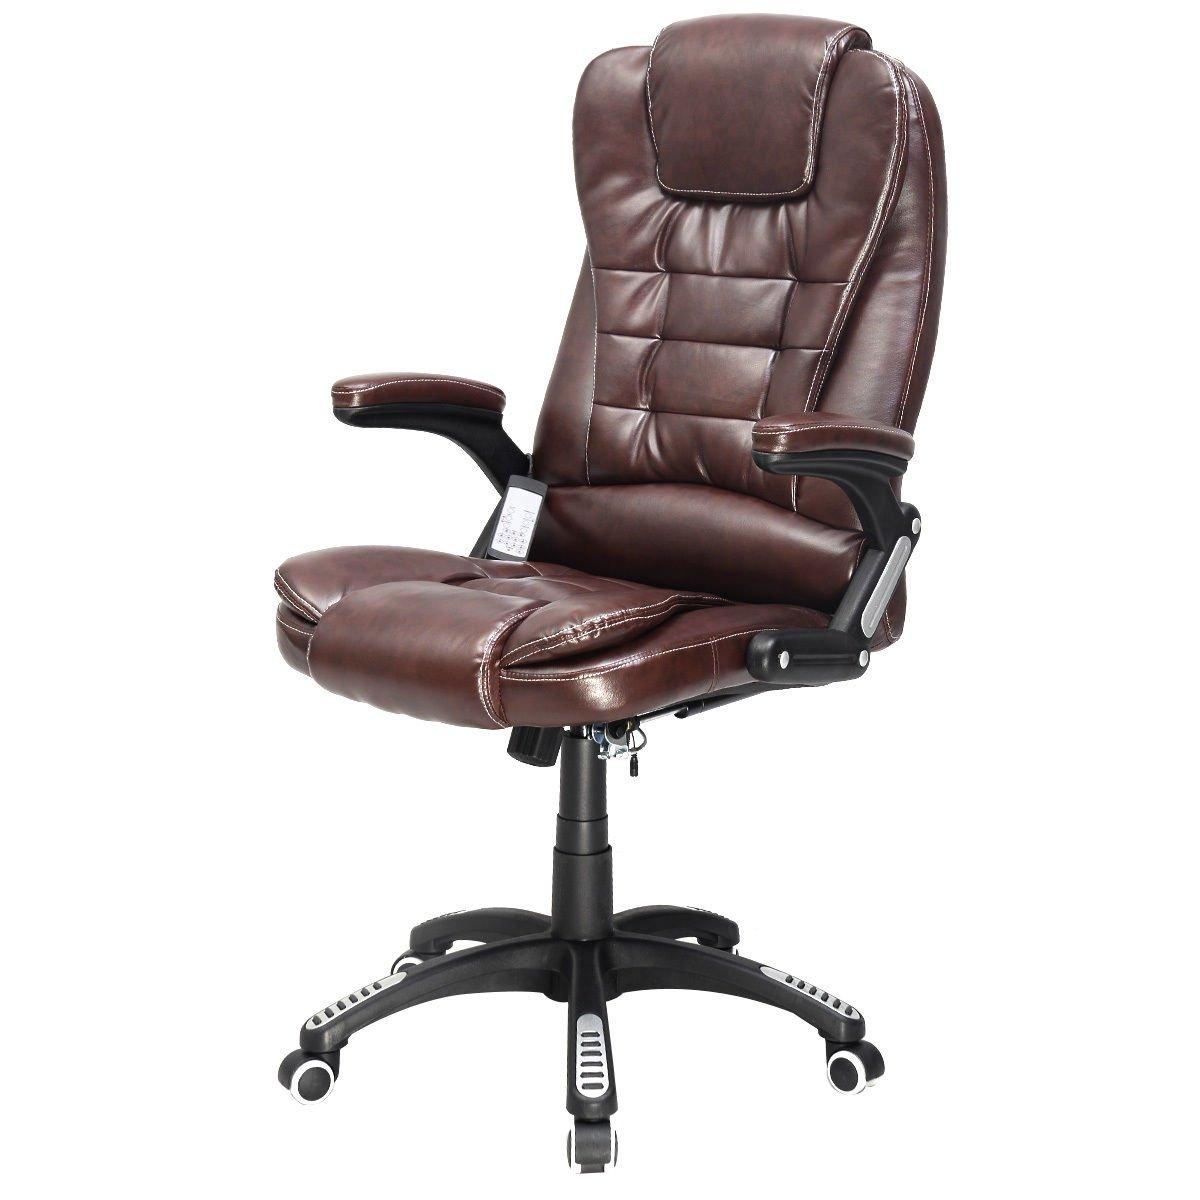 Goplus Brown Executive Ergonomic Computer Desk Massage Chair Vibrating Home Office New